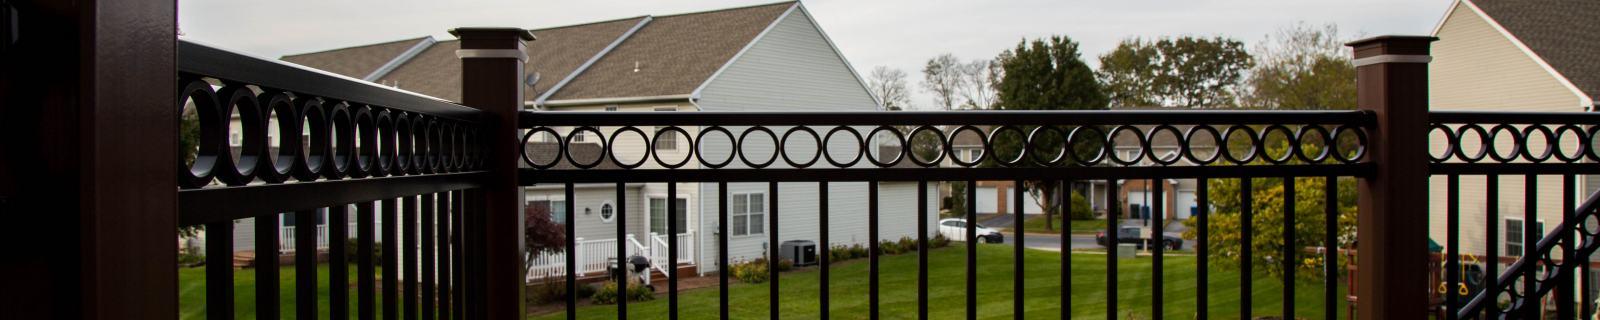 new deck vinyl railings